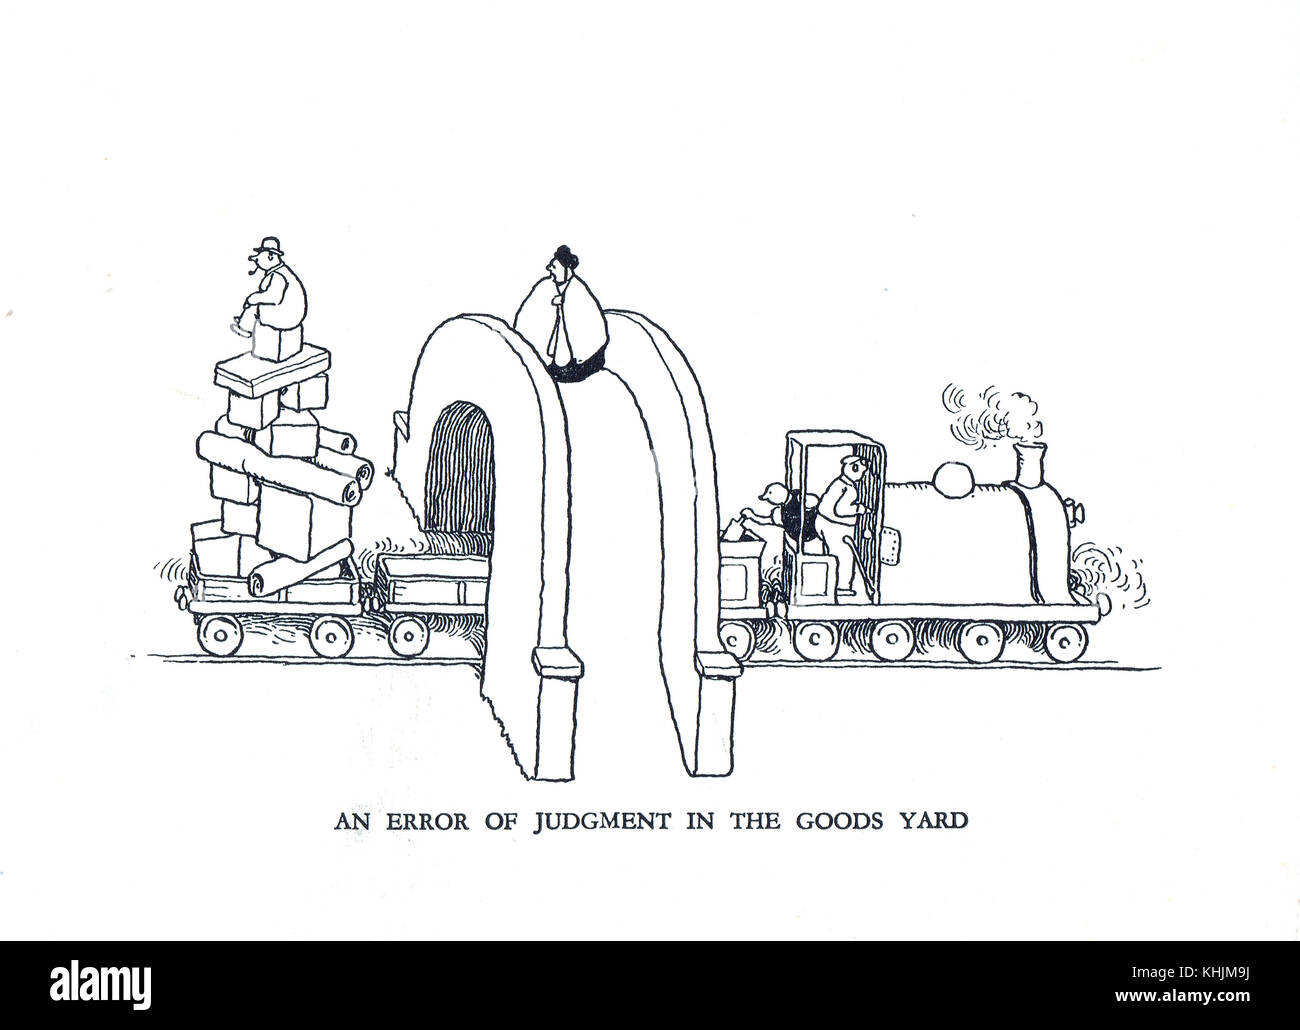 An error of judgment in the Goods yard, Cartoon by William Heath Robinson Stock Photo